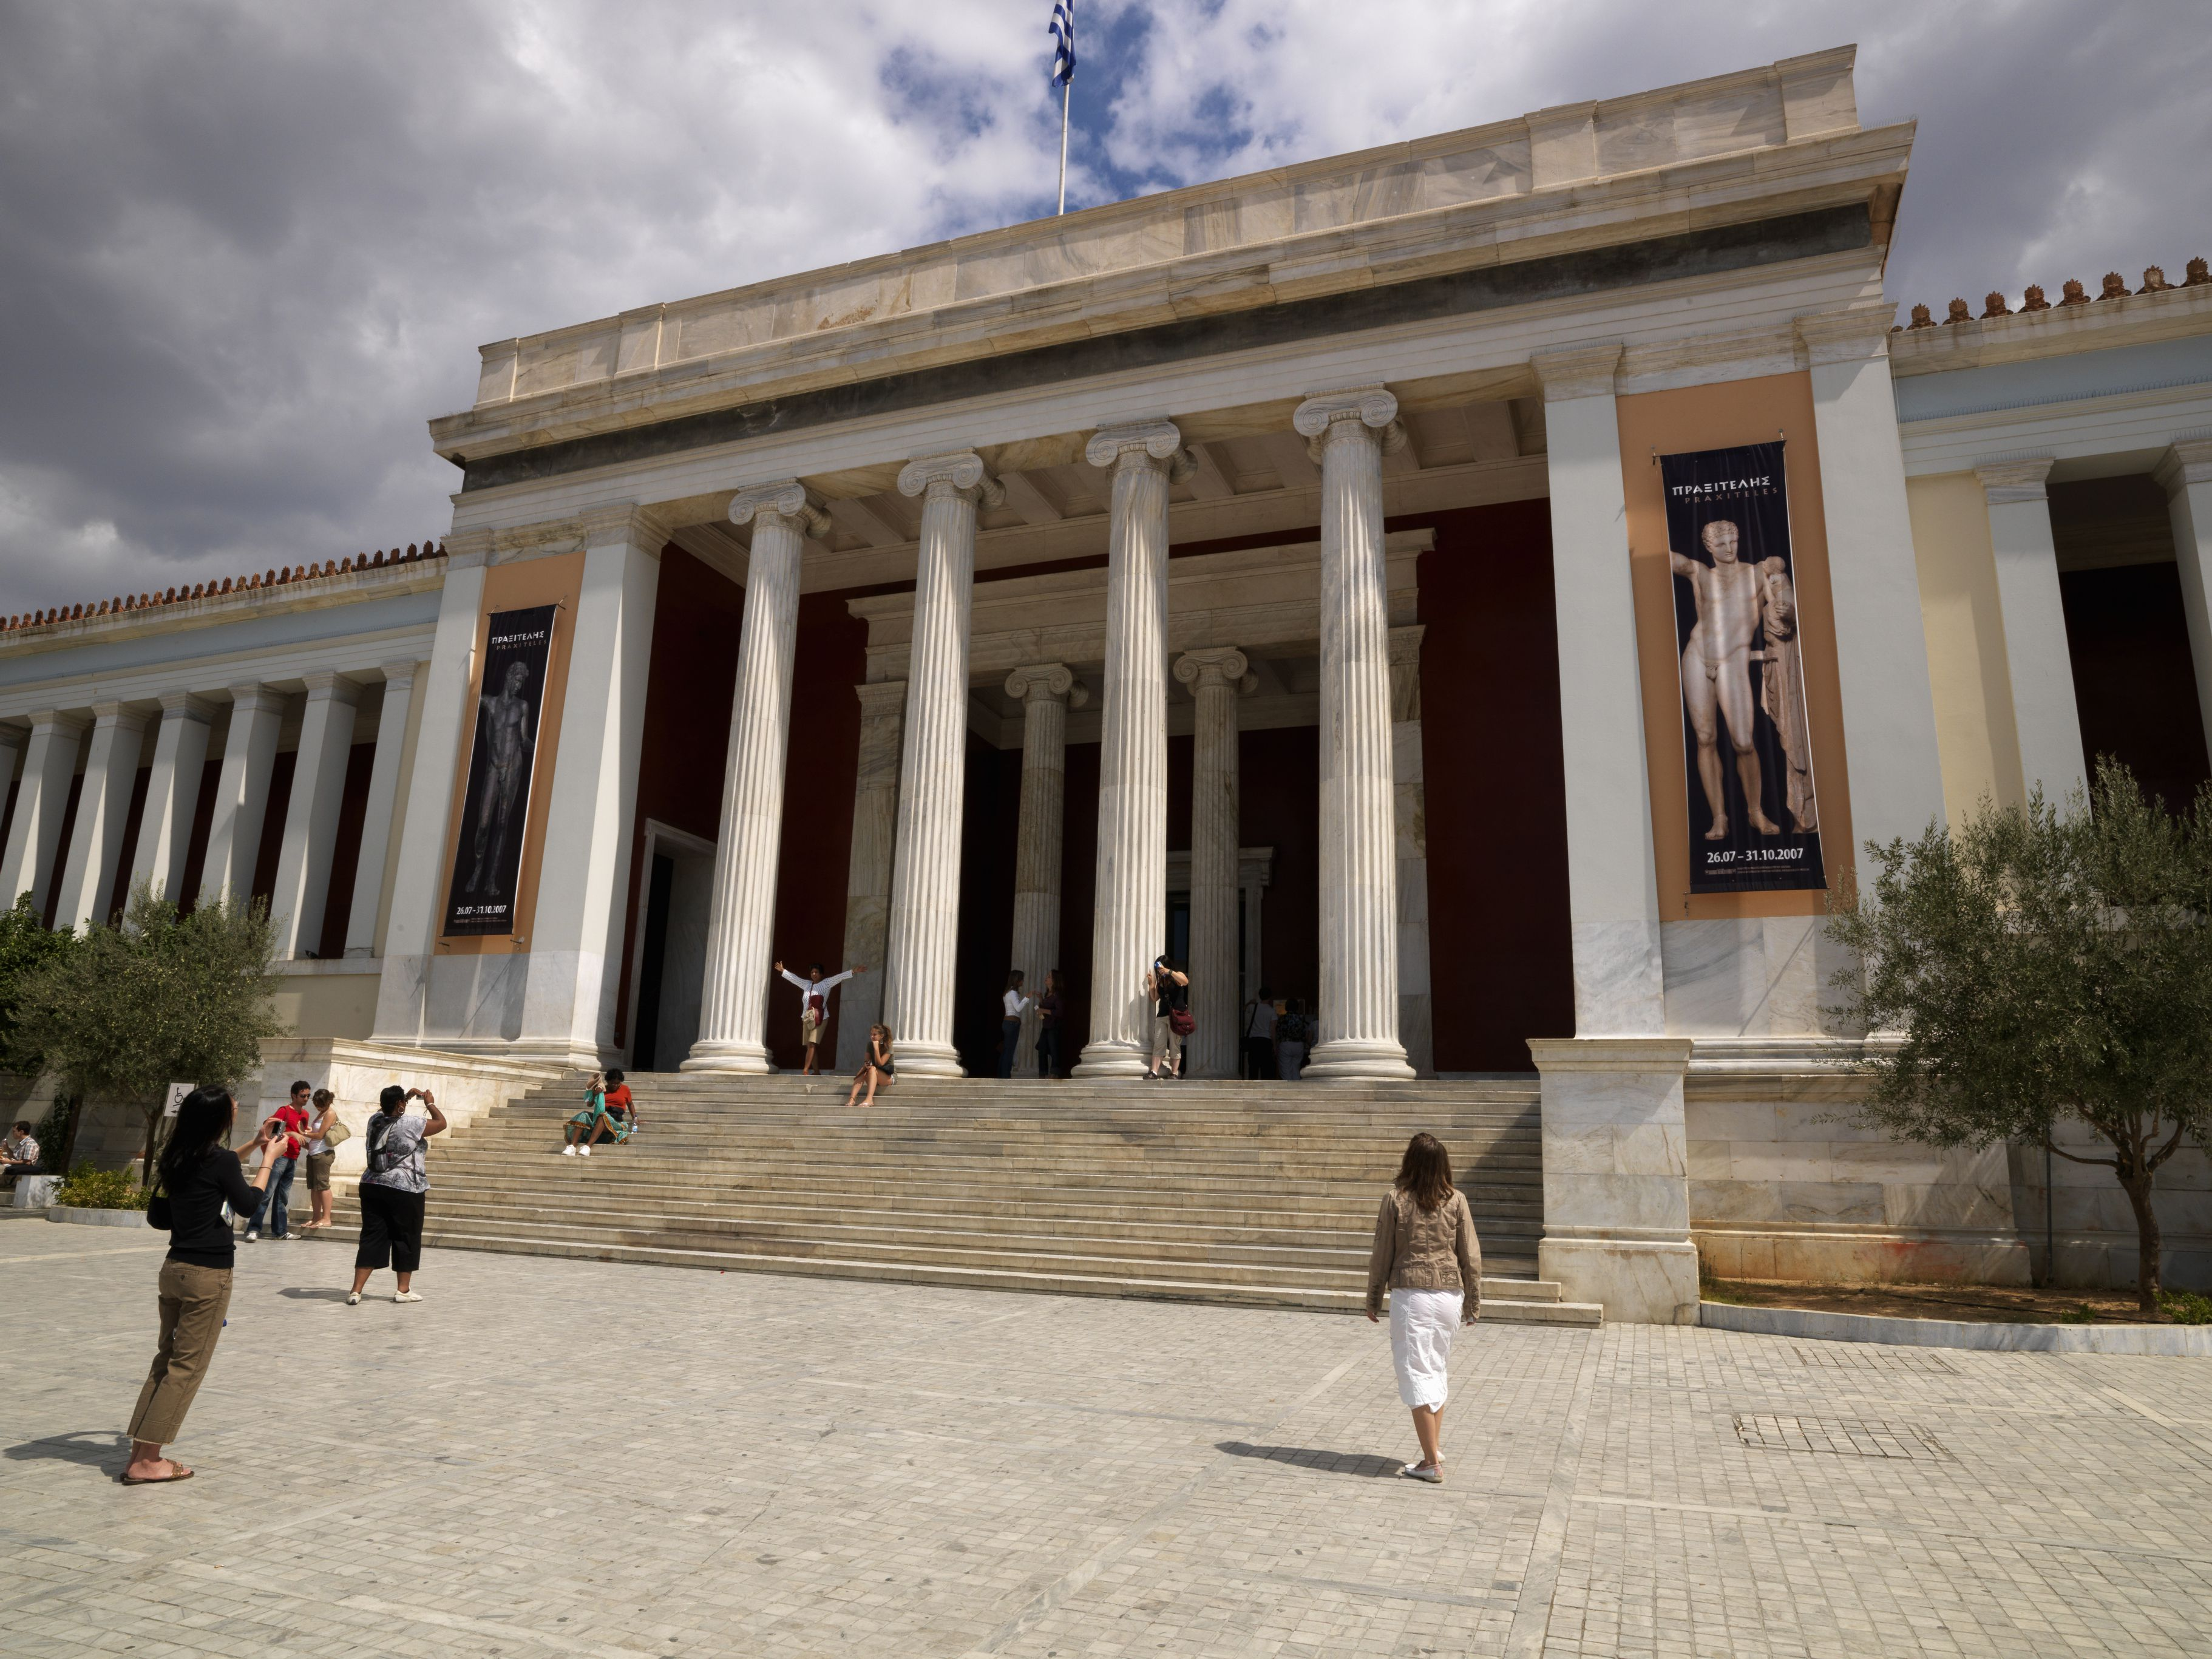 Facade of a museum, National Archaeological Museum, Athens, Attica, Greece